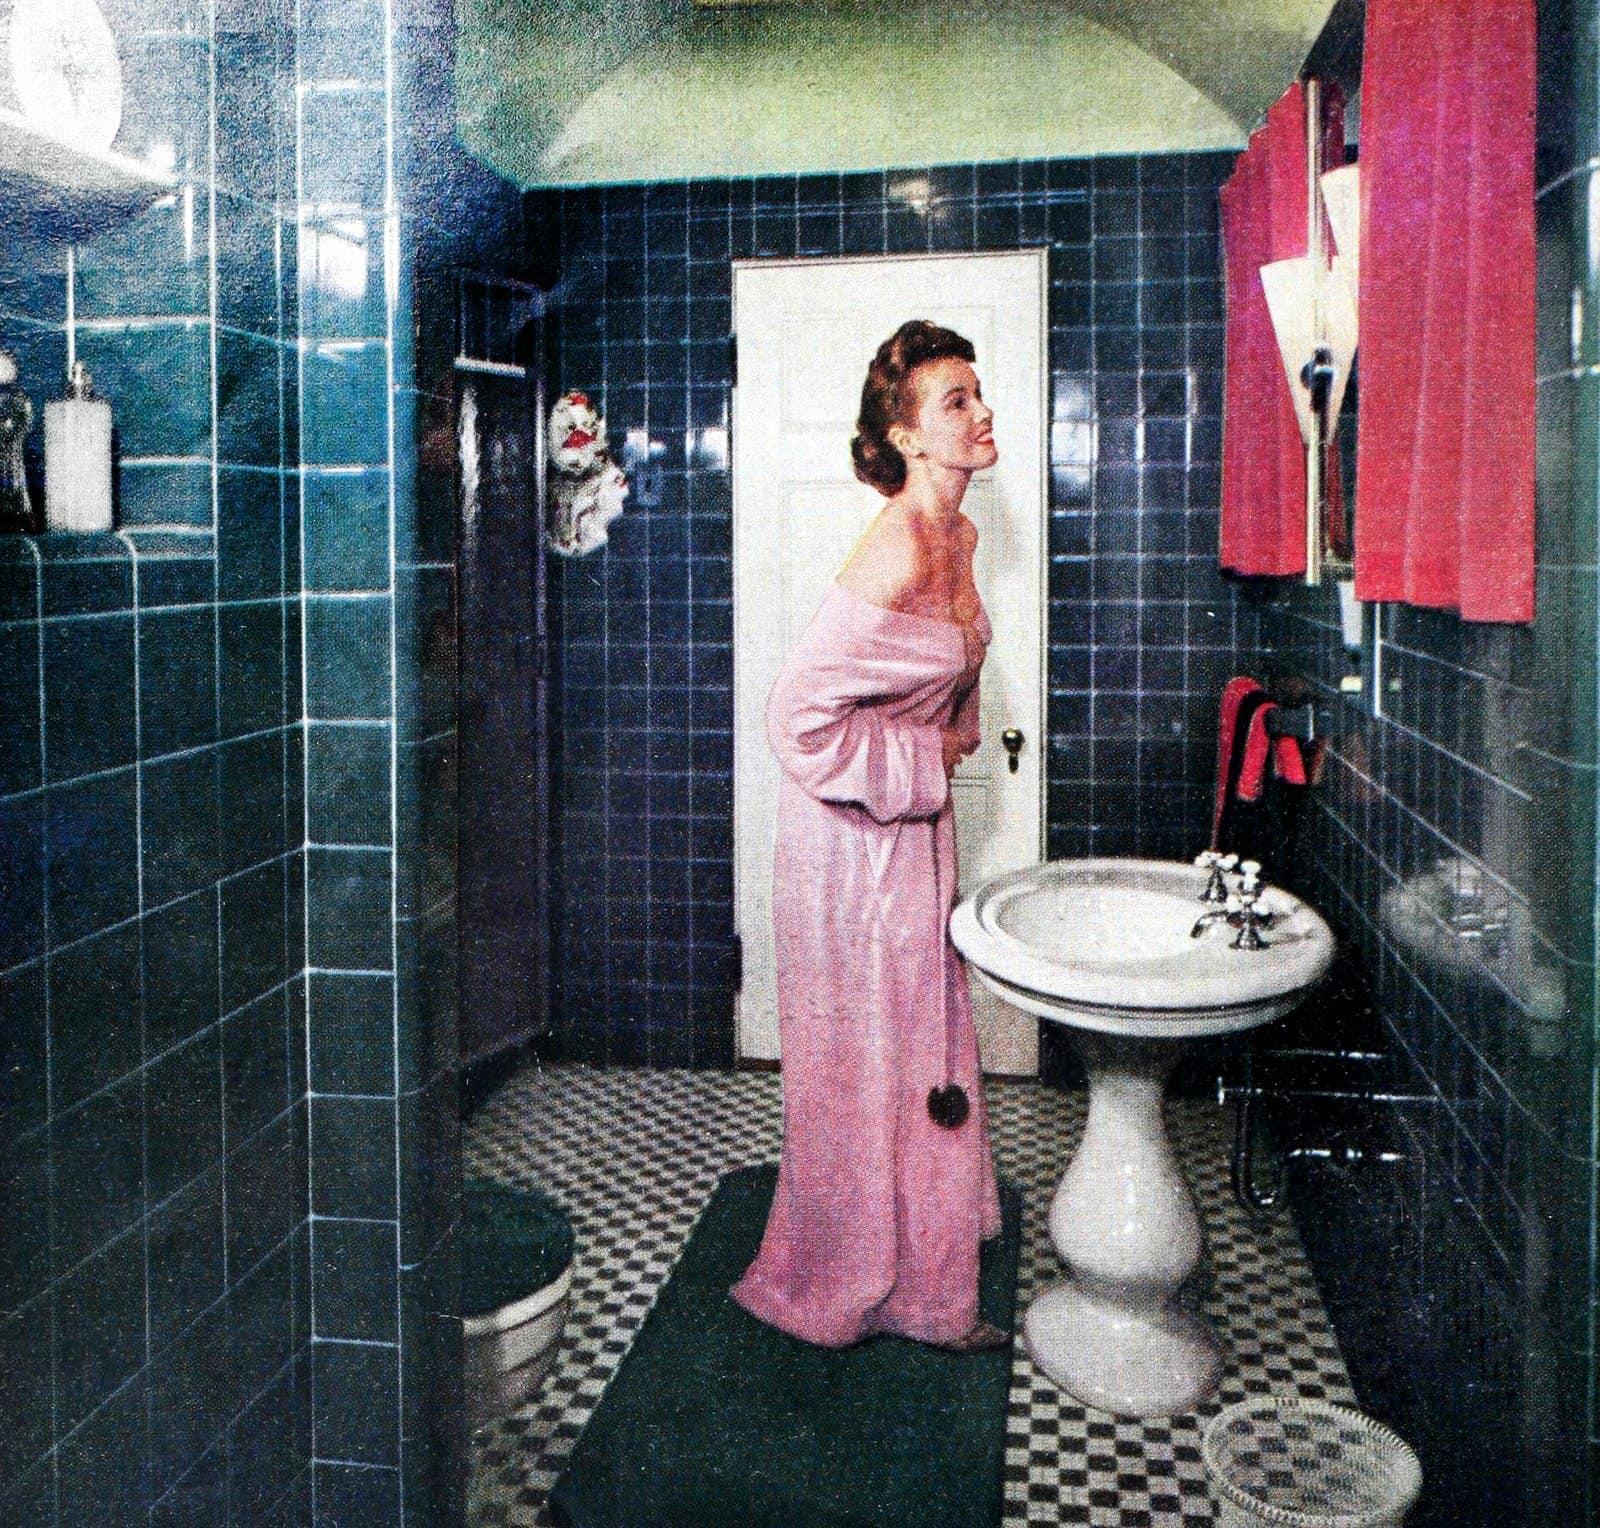 1950s woman in a teal tiled bathroom